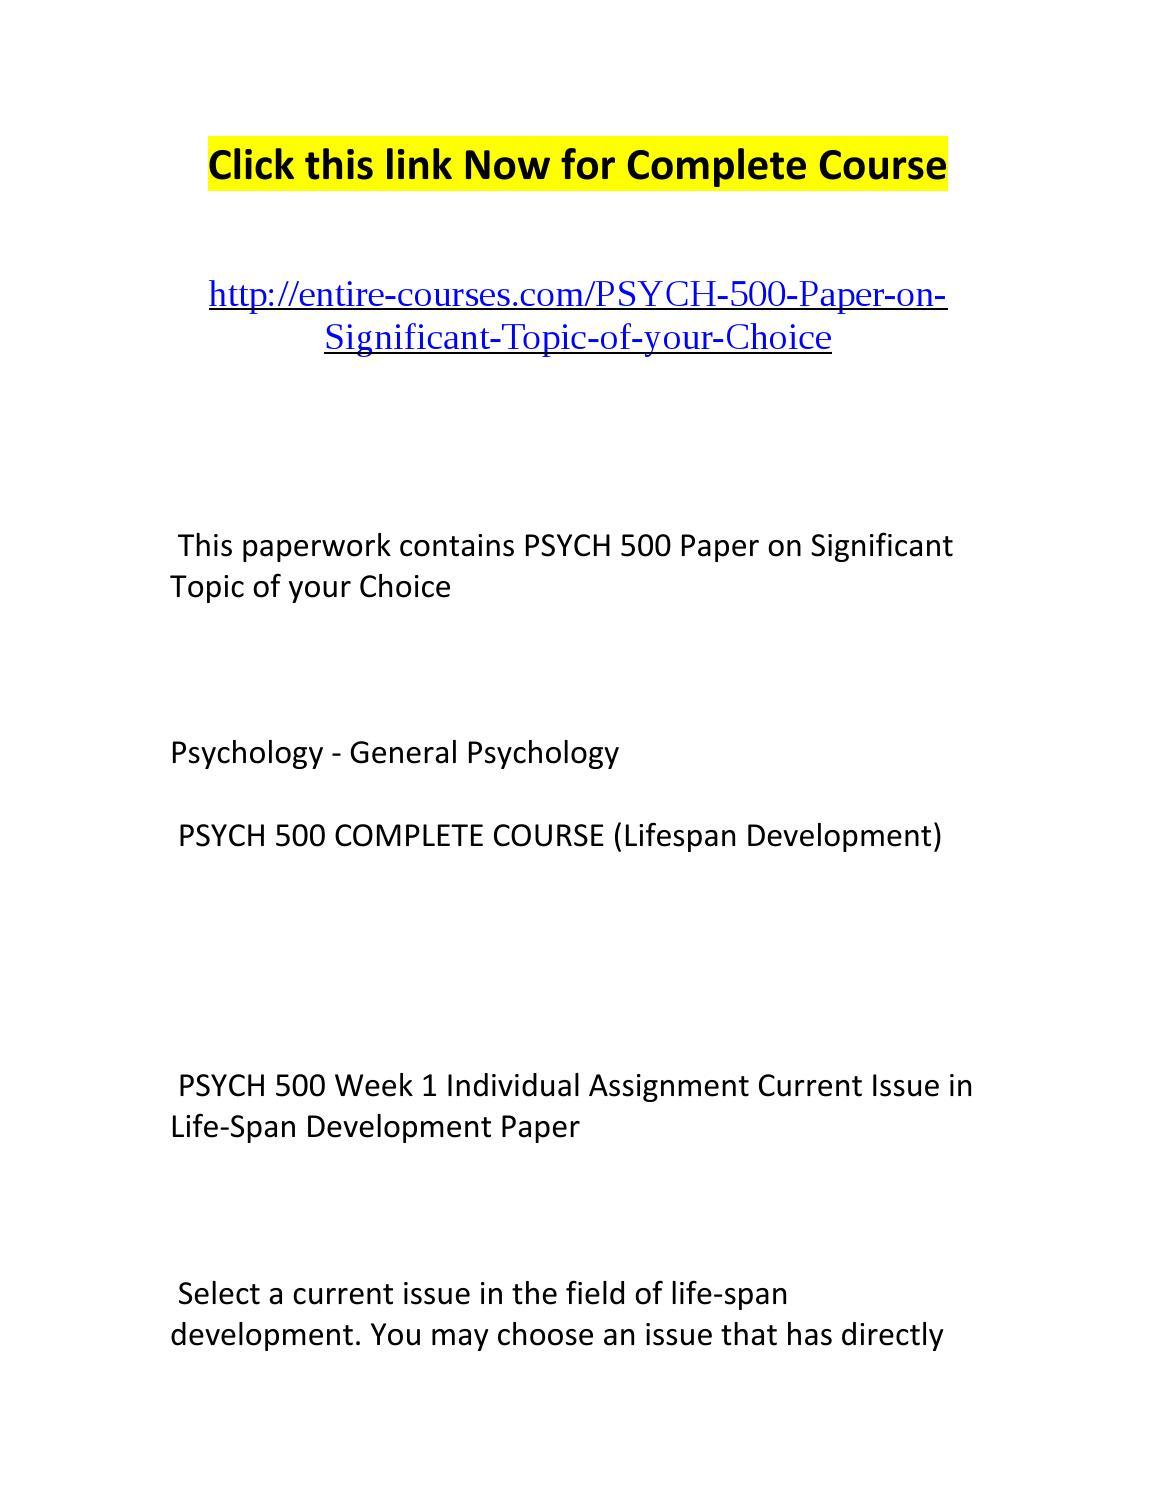 lifespan development paper topics